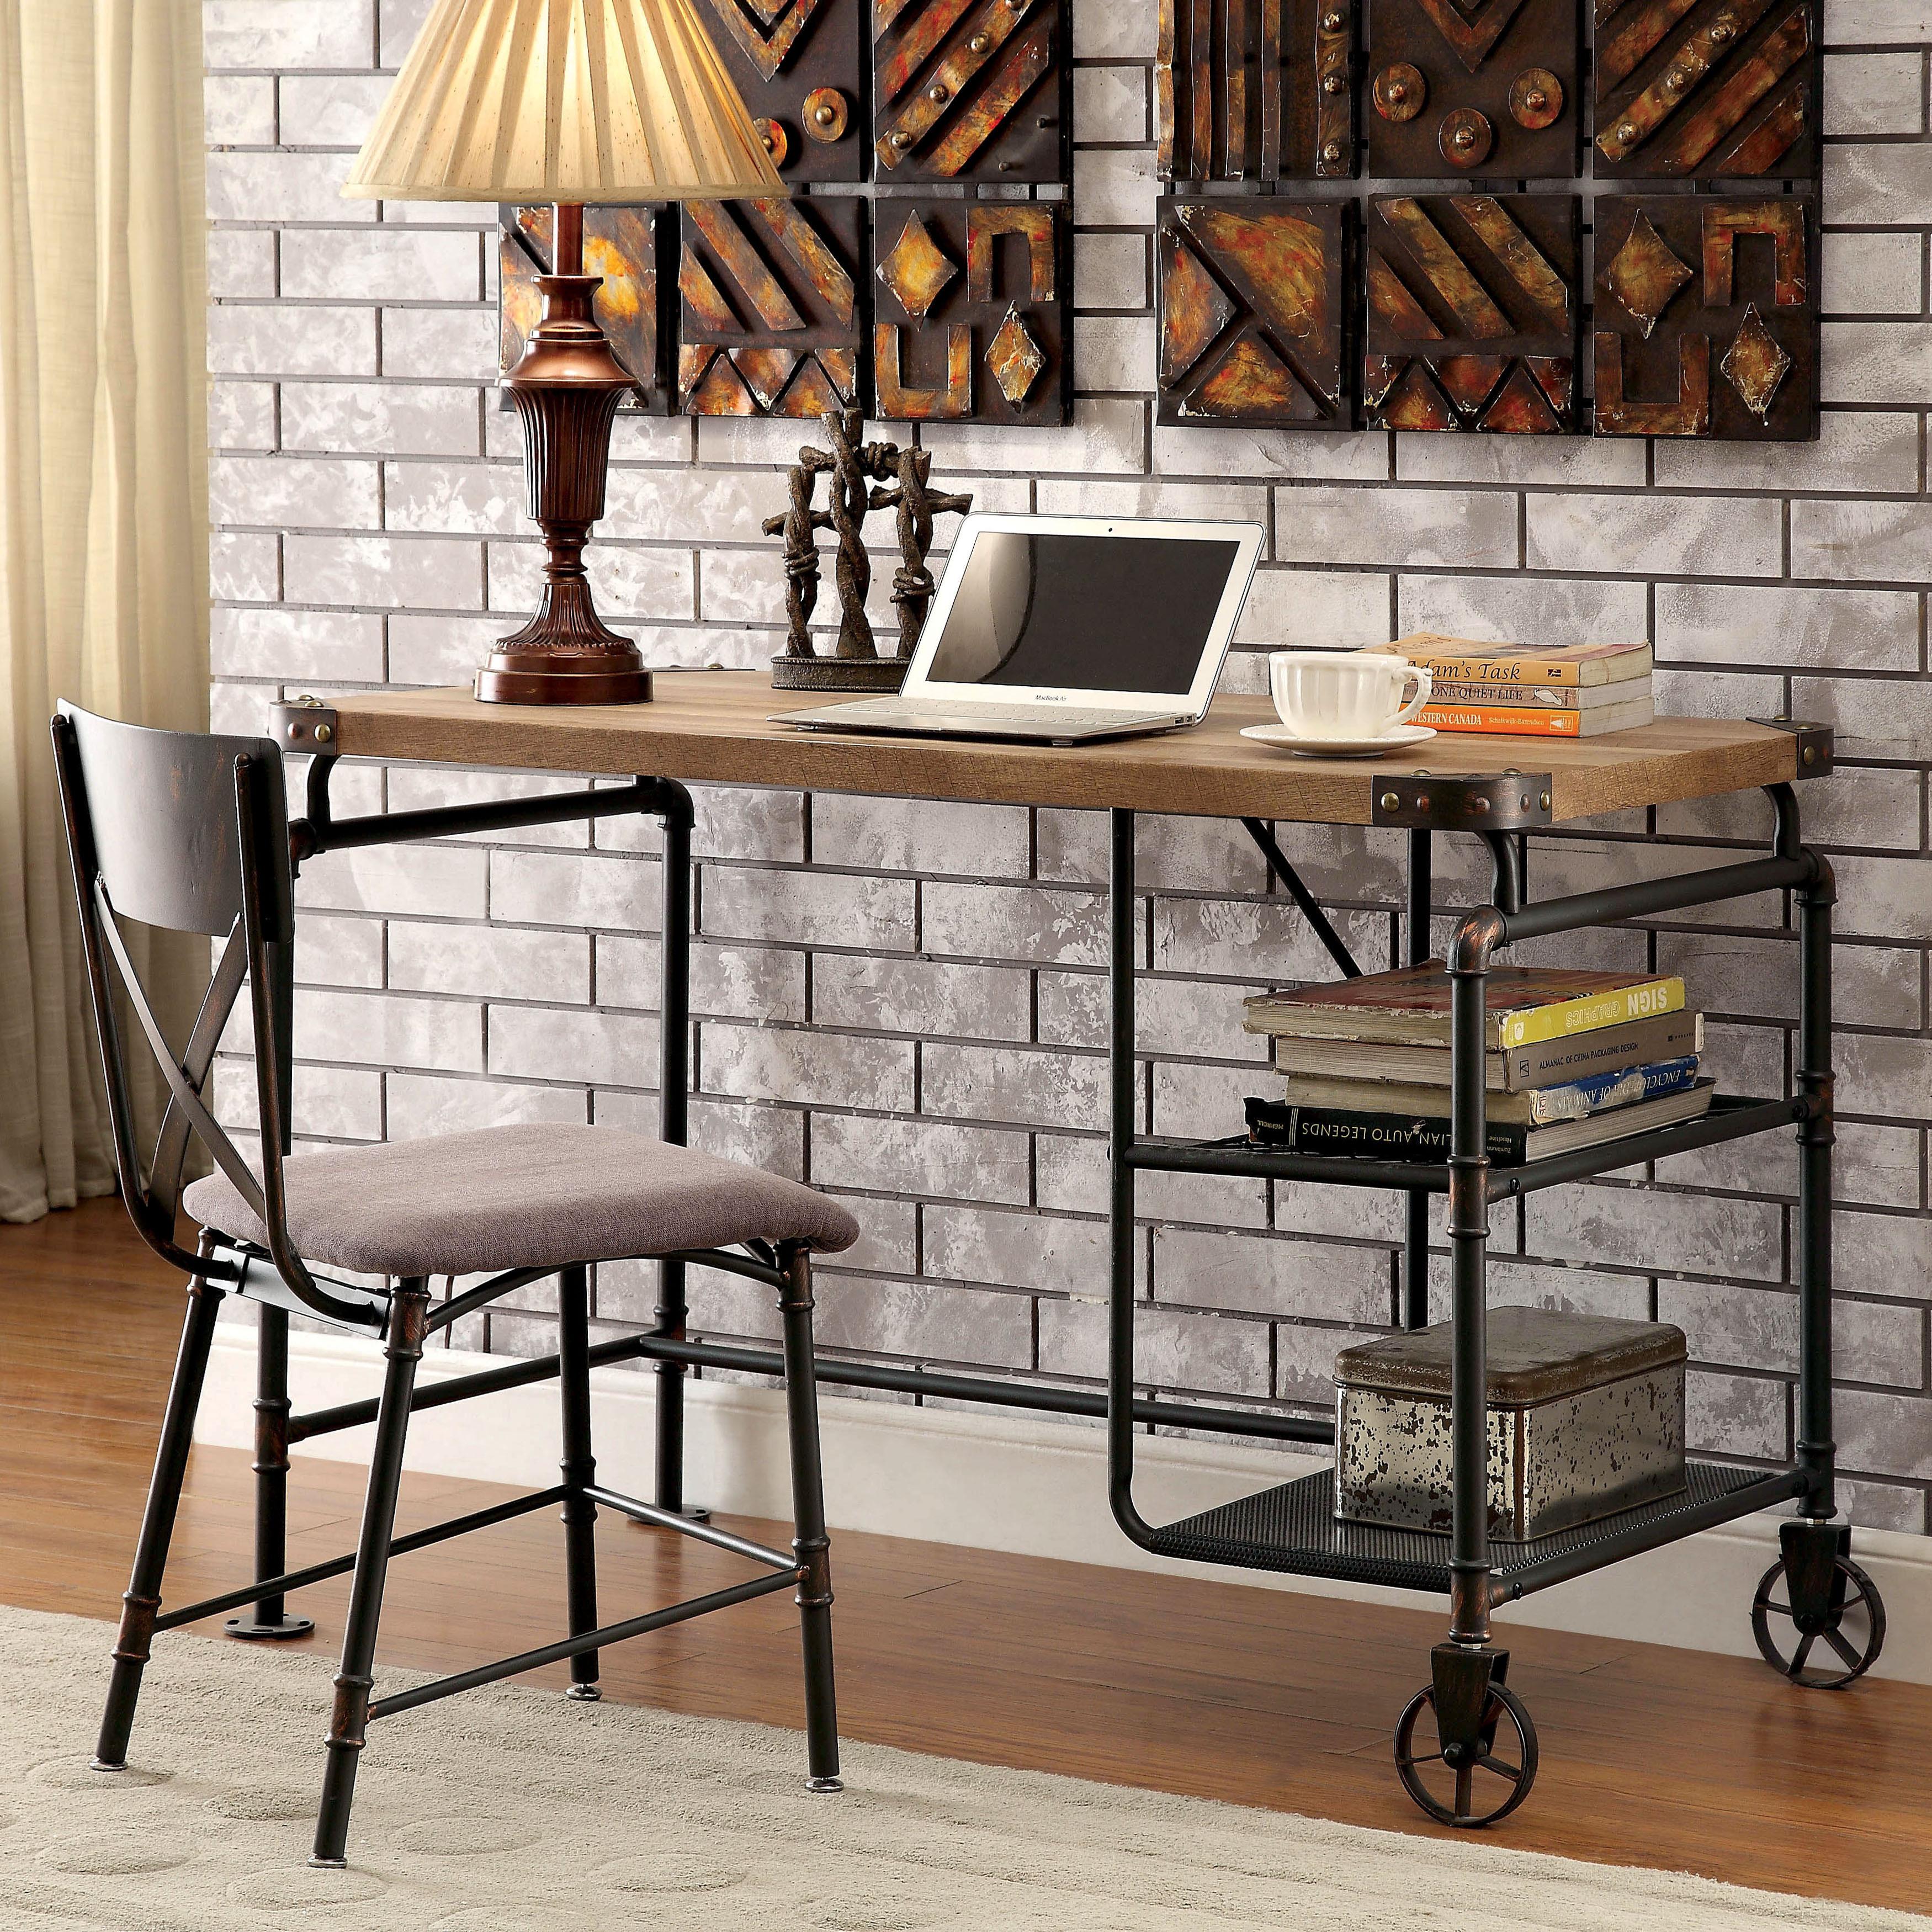 Computer desk 2 shelf industrial home office furniture writing antique black new